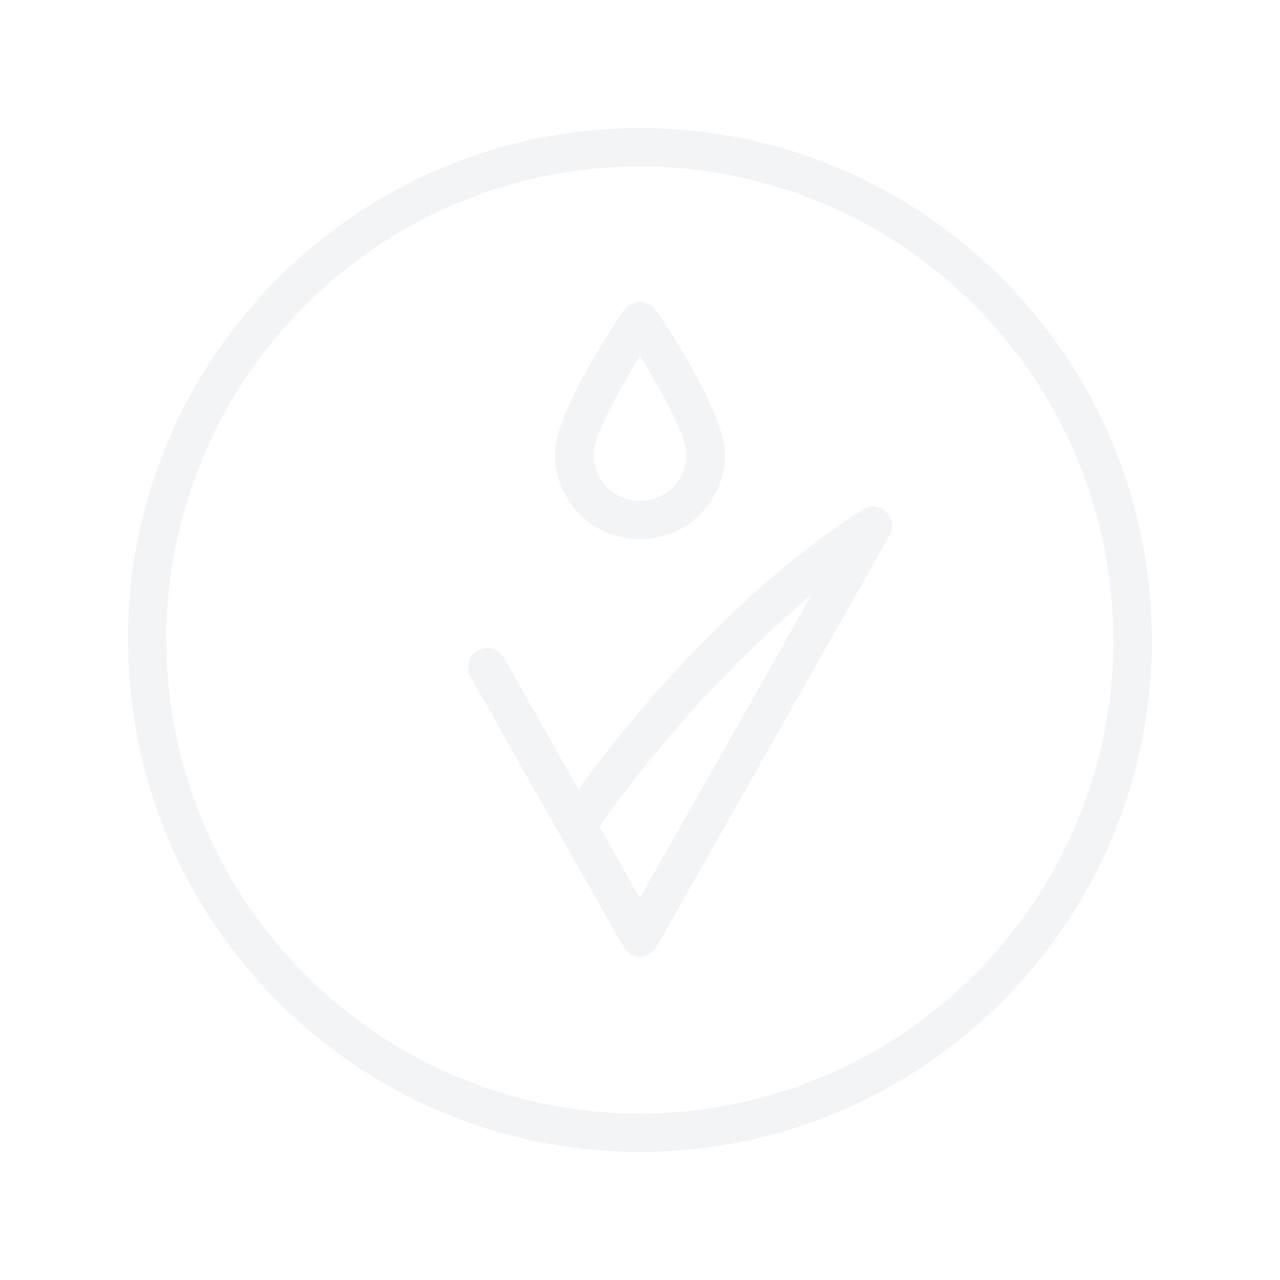 BATISTE Dry Shampoo Tempt 200ml